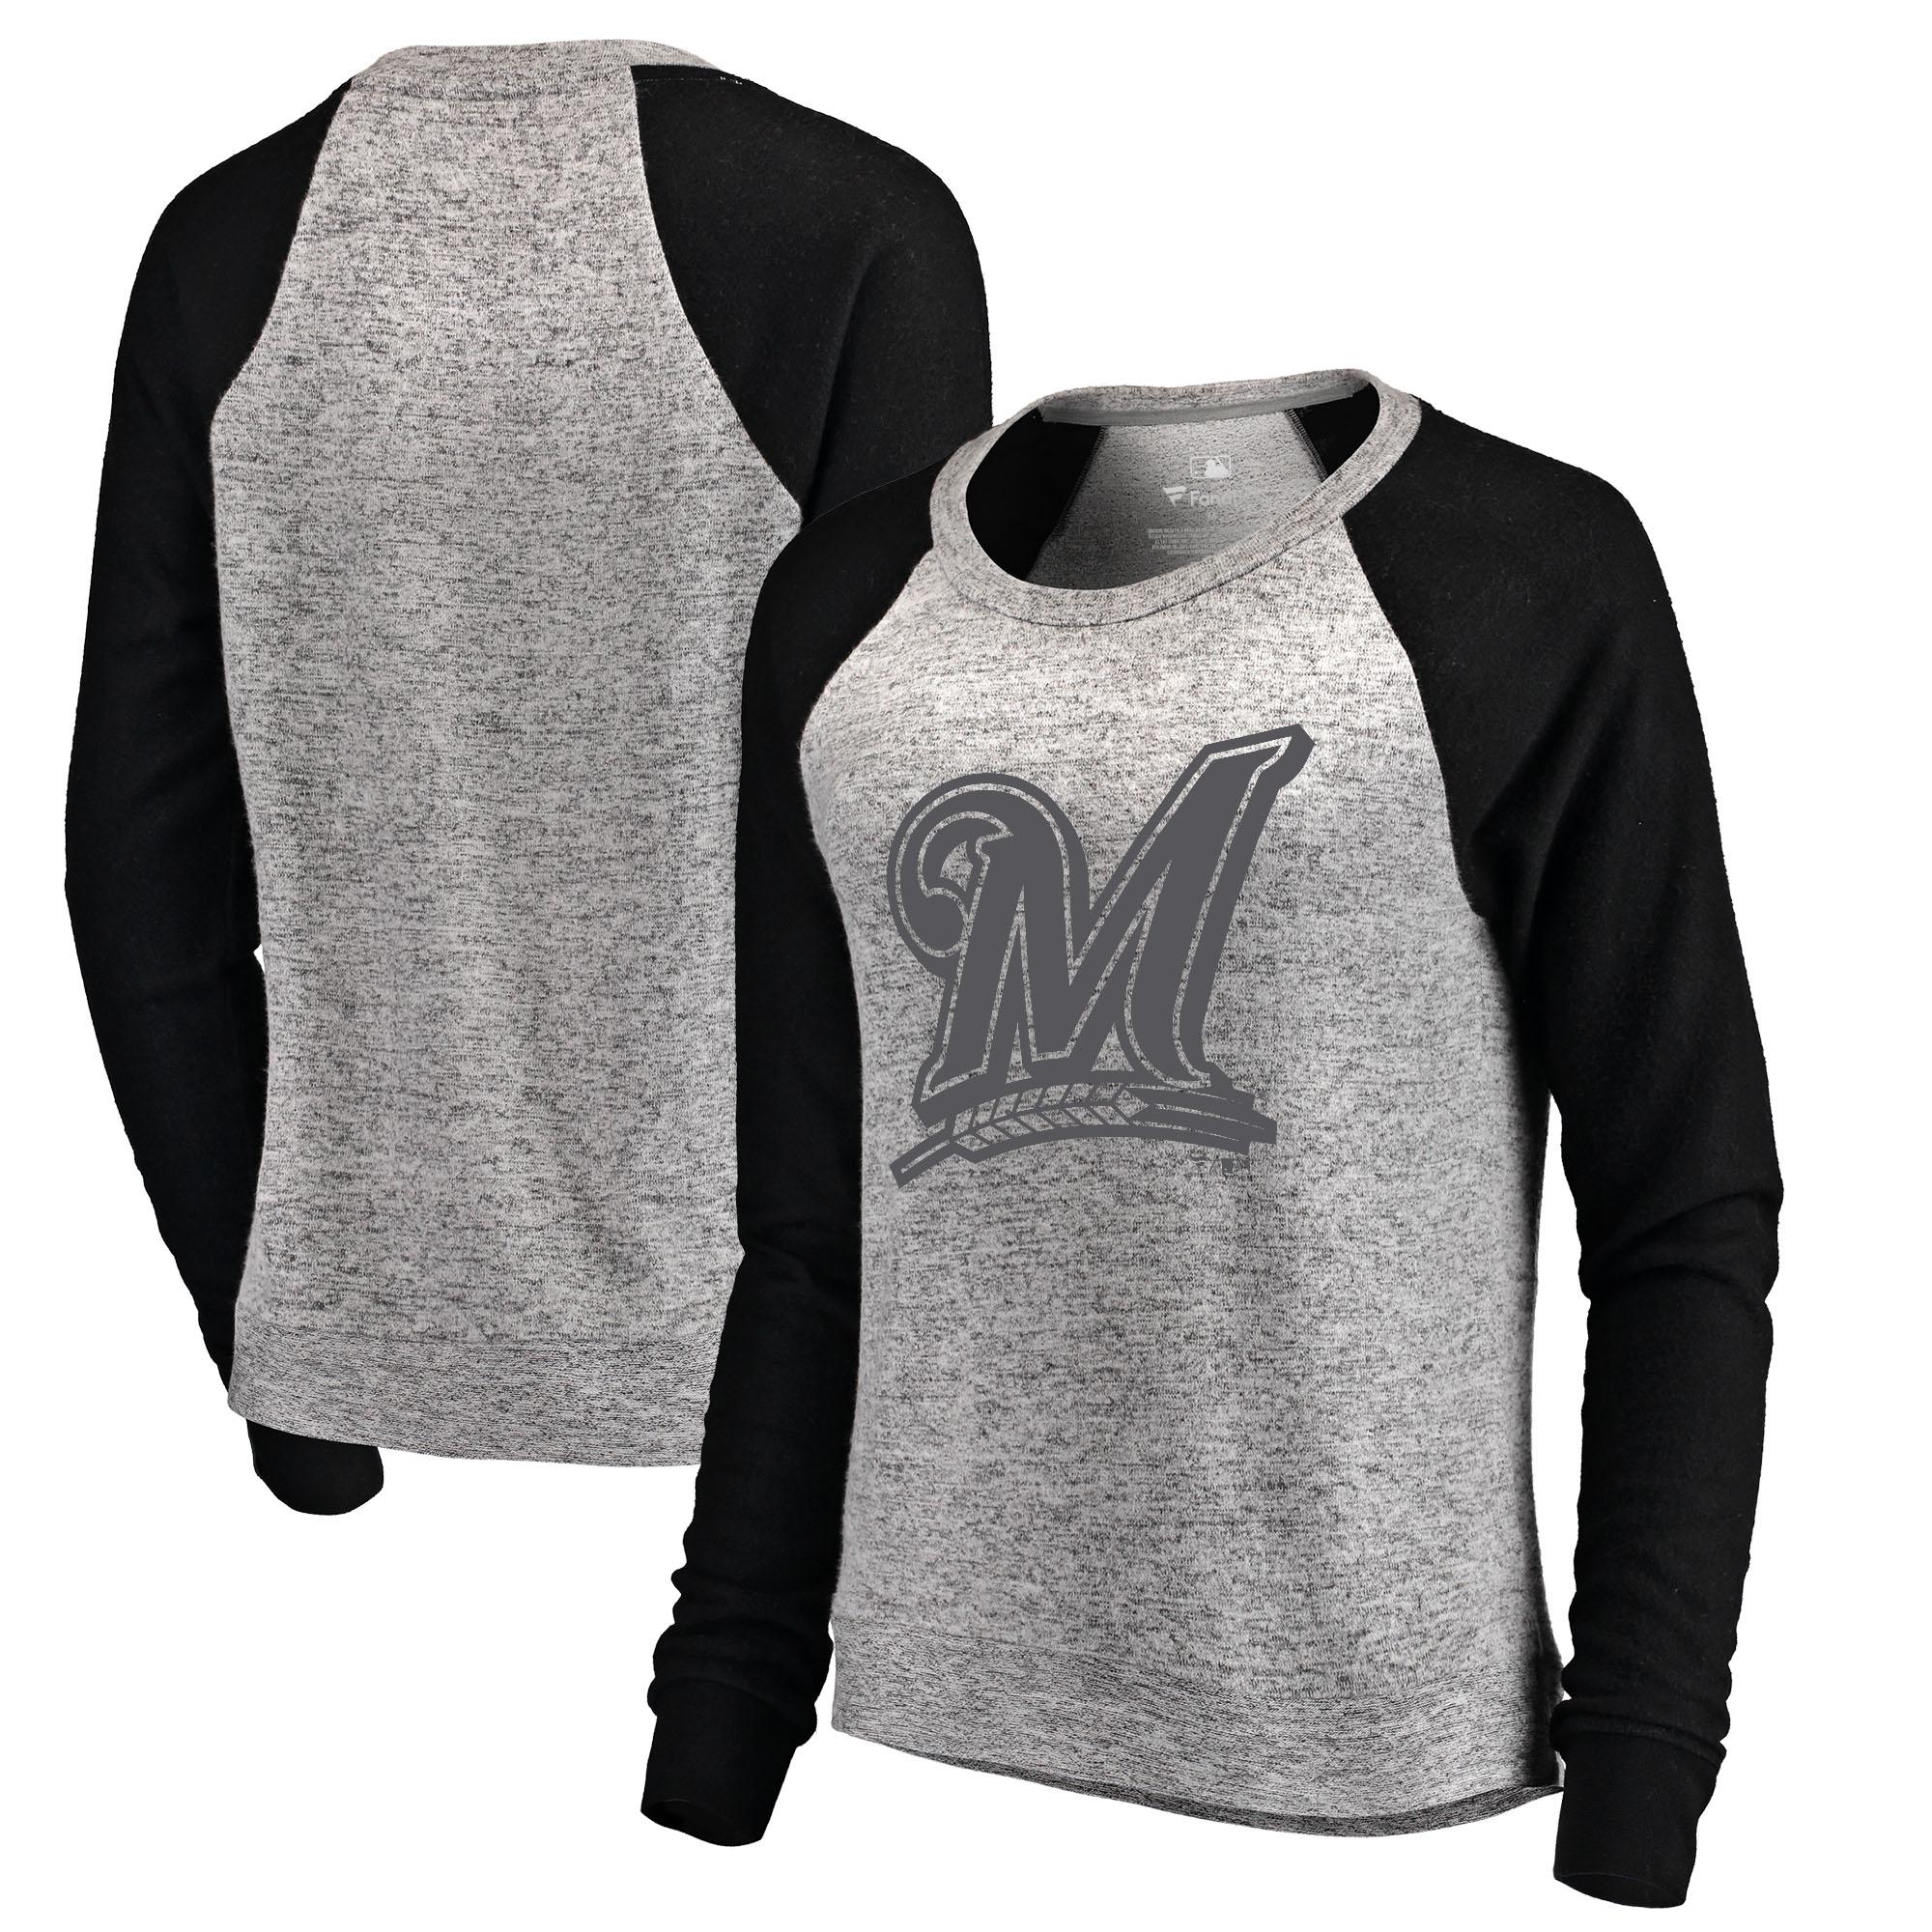 Milwaukee Brewers Let Loose by RNL Women's Cozy Collection Plush Raglan Tri-Blend Sweatshirt - Ash